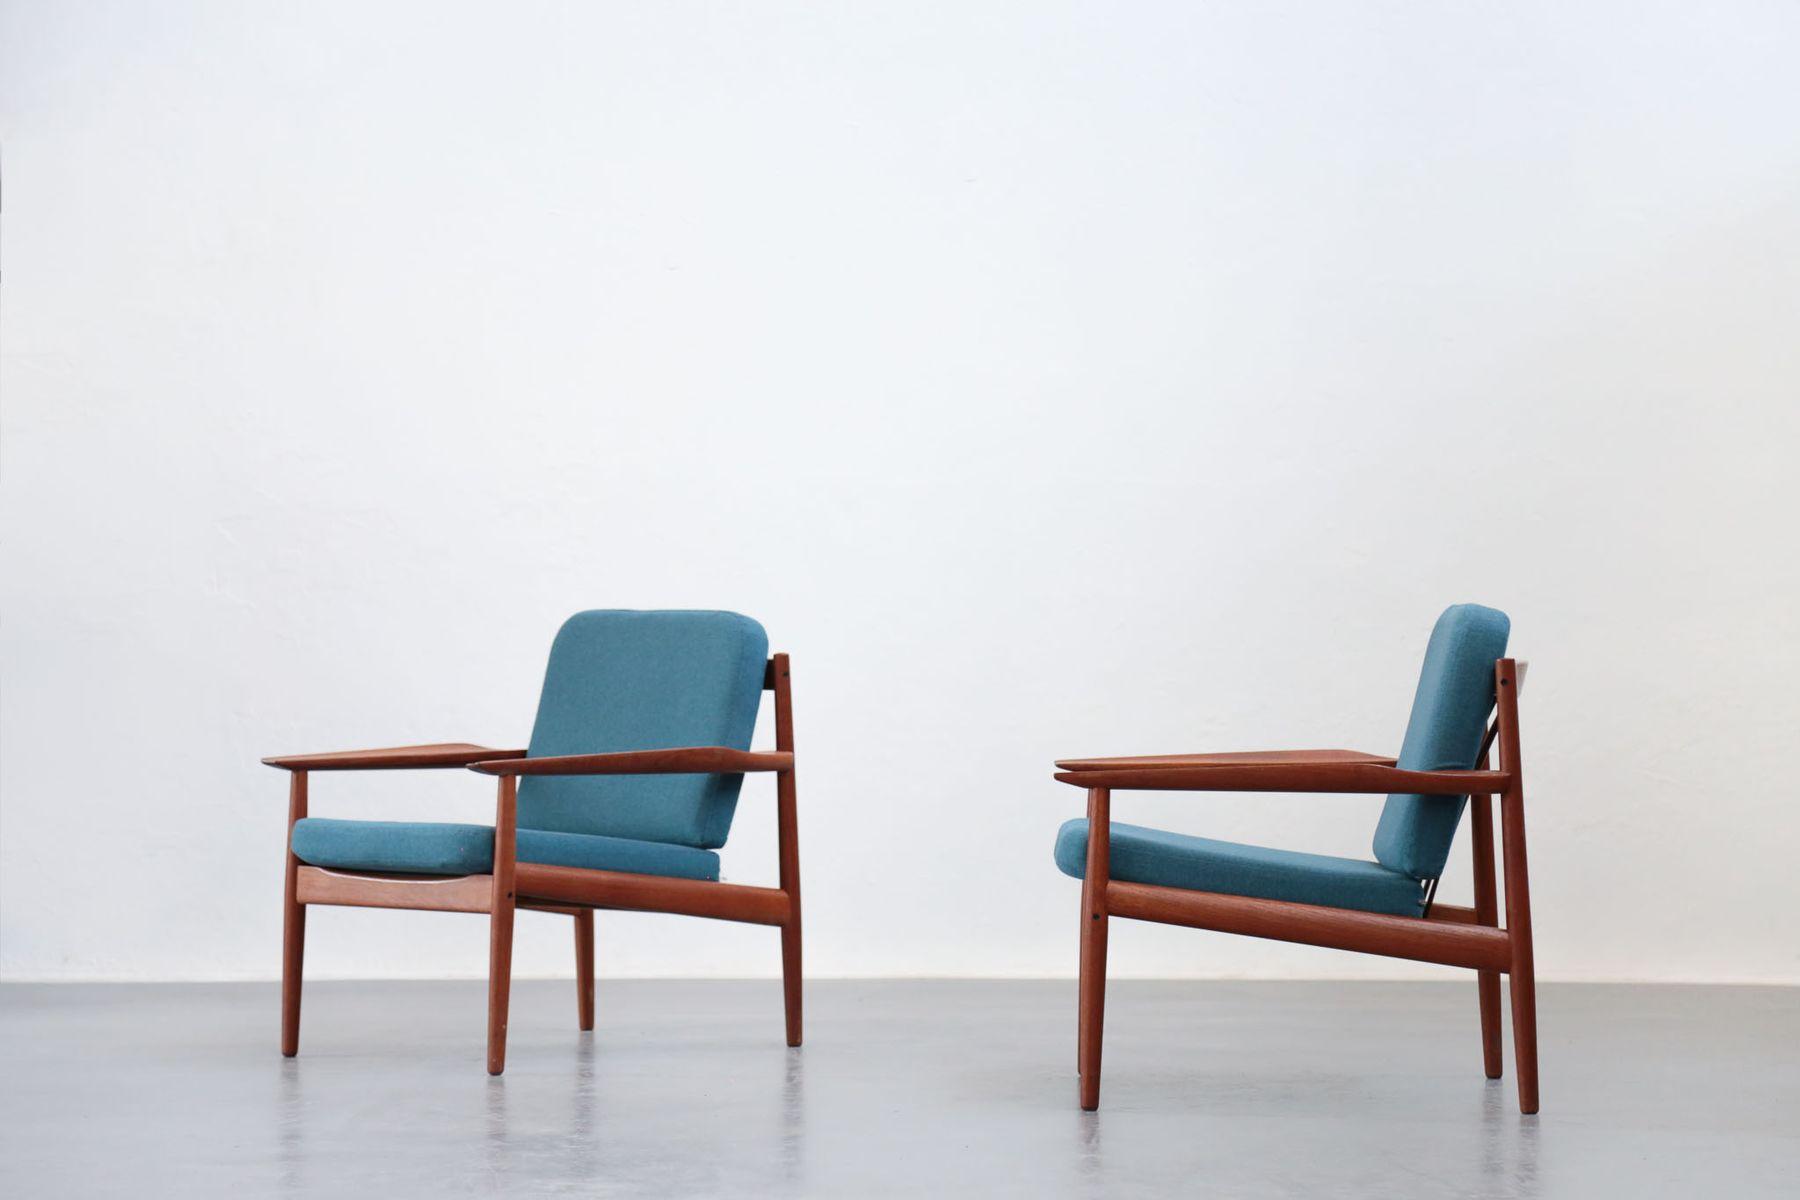 Vintage Danish Armchairs by Arne Vodder for Glostrup Set of 2 for